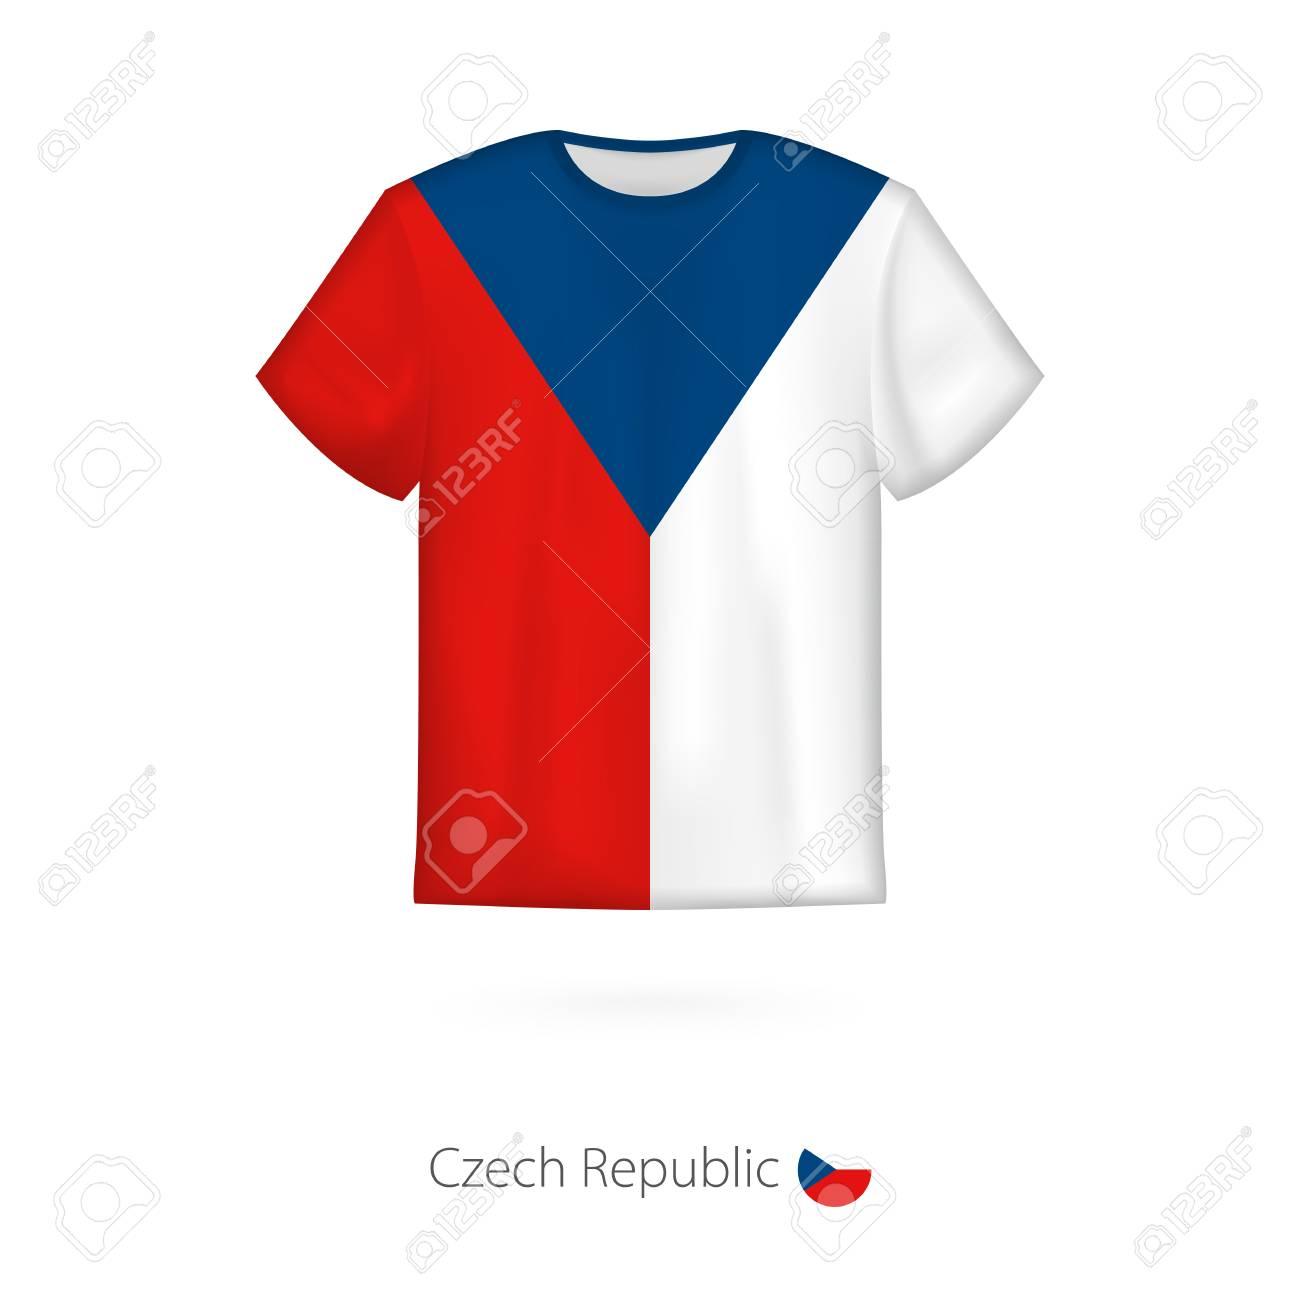 6af9f53cb T-shirt Design With Flag Of Czech Republic. T-shirt Vector Template ...